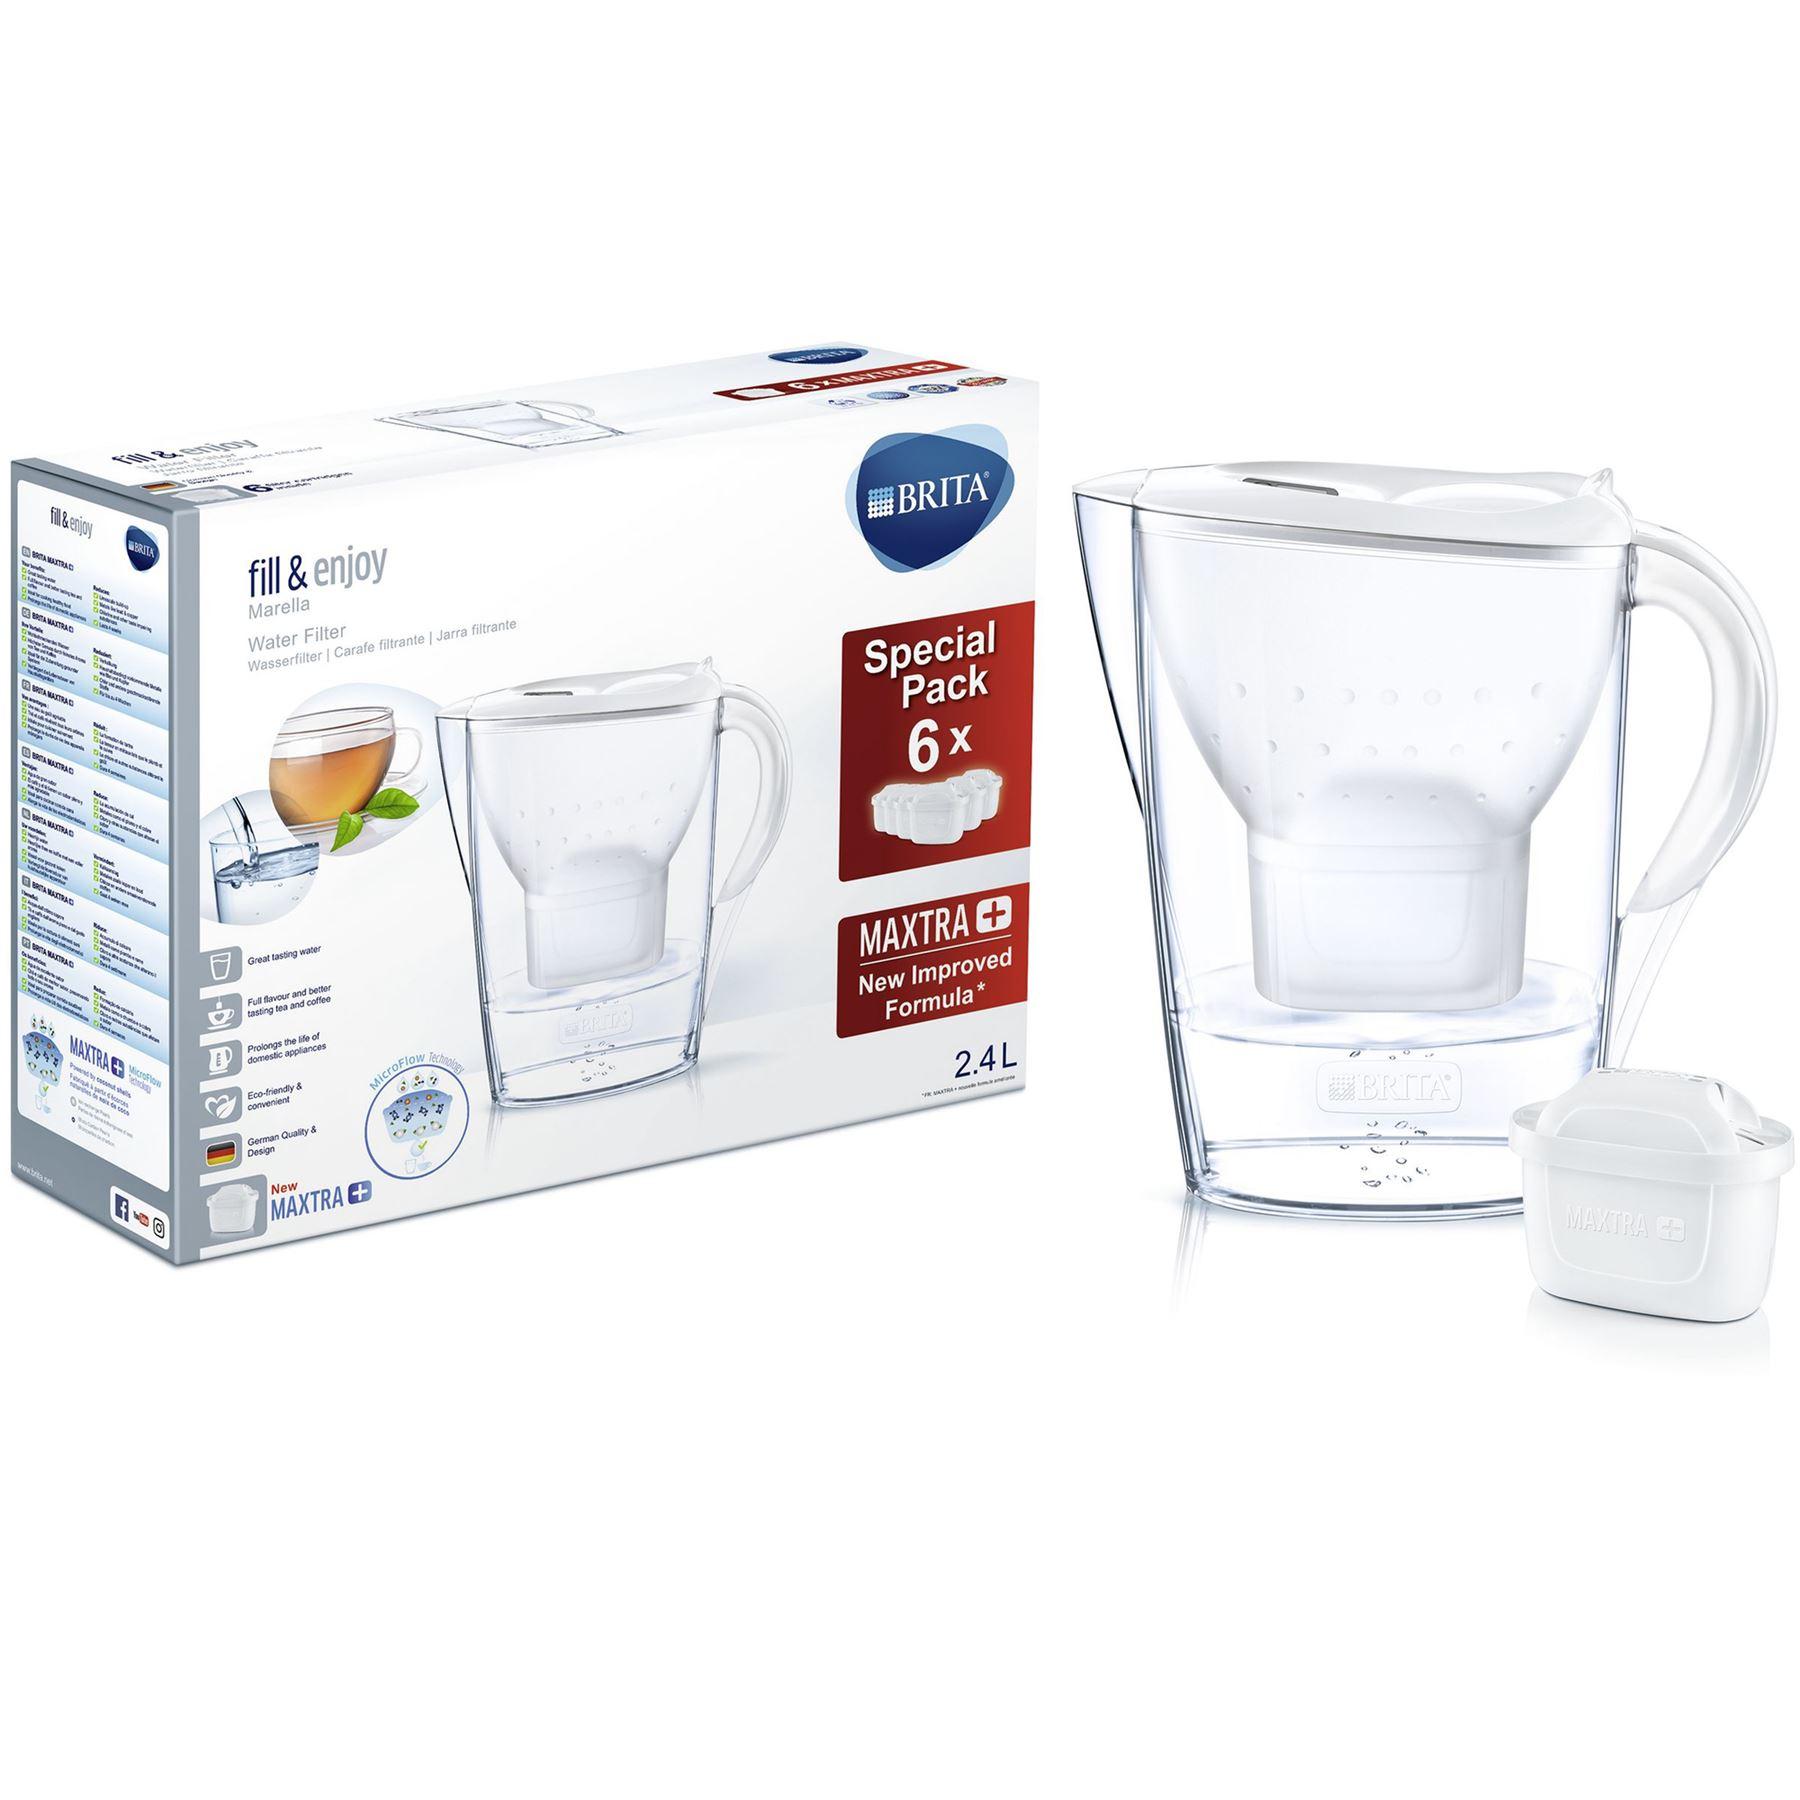 BRITA Marella Cool Water Filter Jug and 6 MAXTRA+ Cartridges £25.99  ozaroo-uk / eBay uk